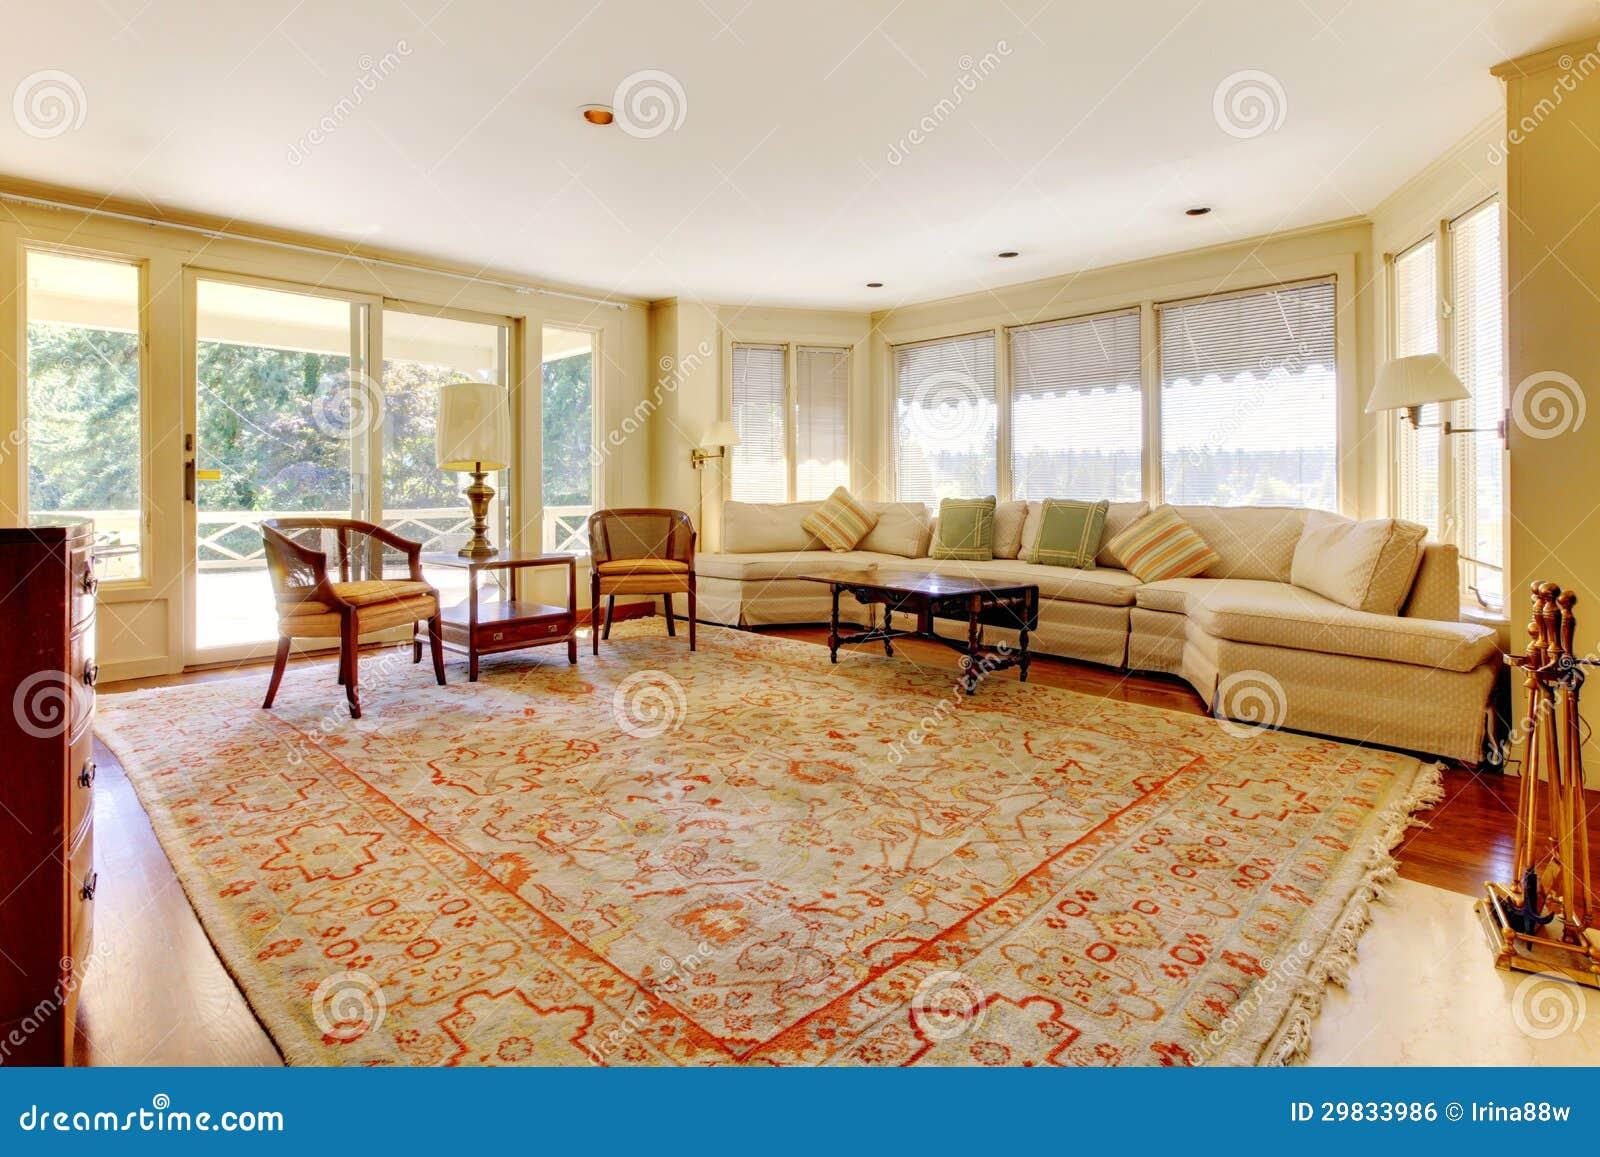 Emejing maison americaine interieur images design trends - Interieur de maison americaine ...